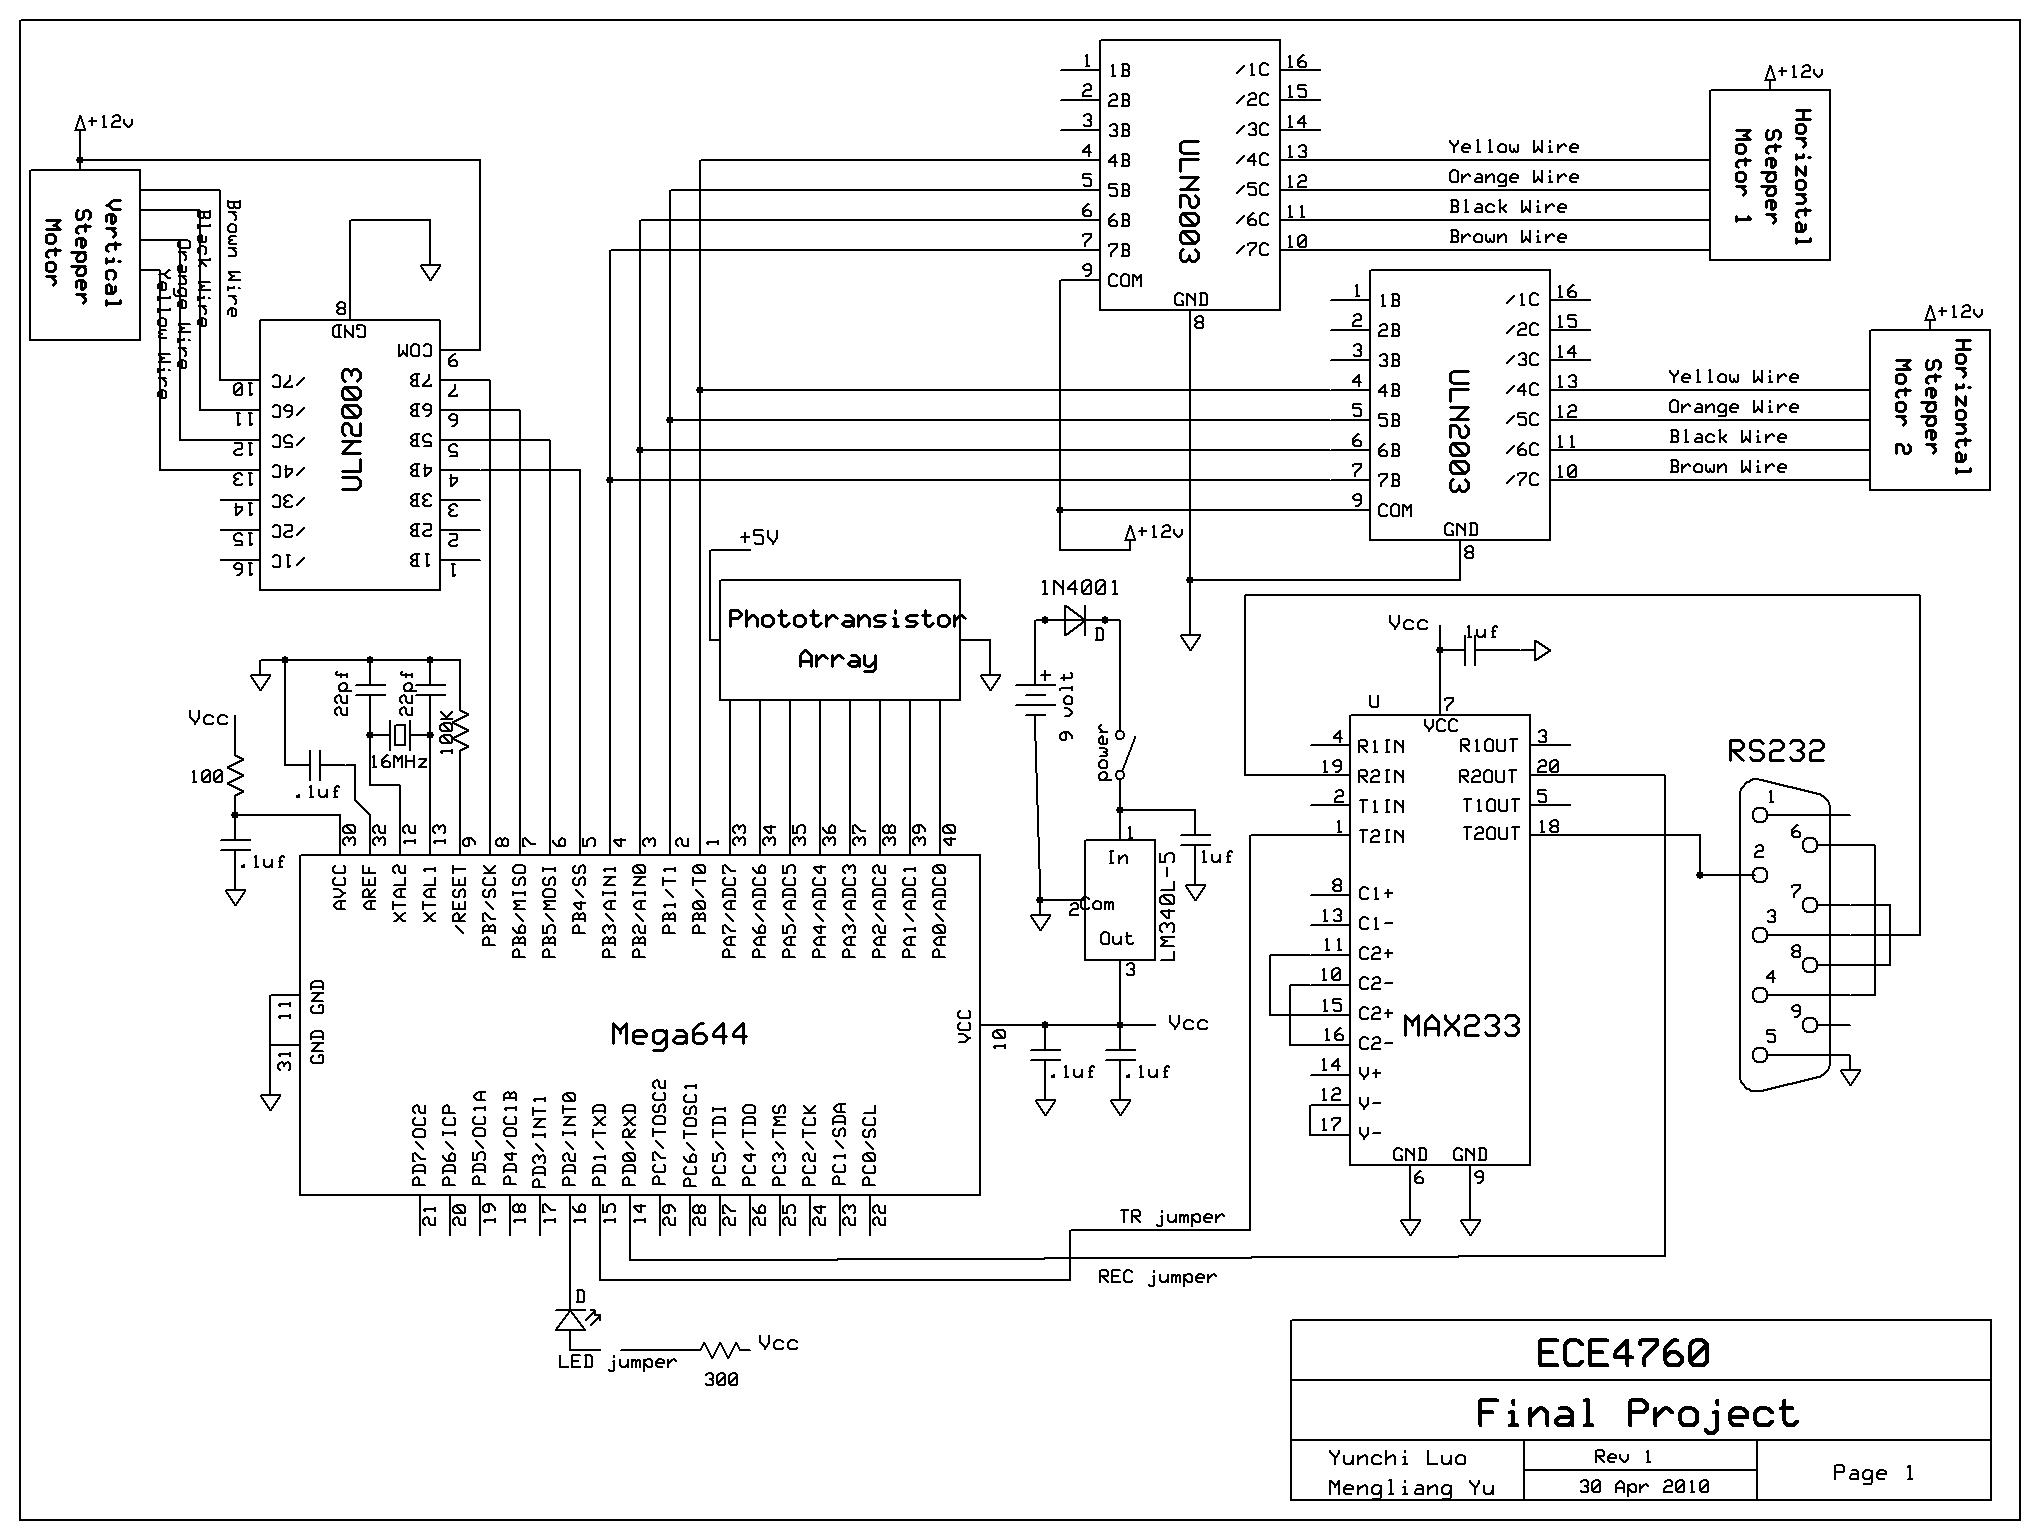 Figure 10 Full Schematic